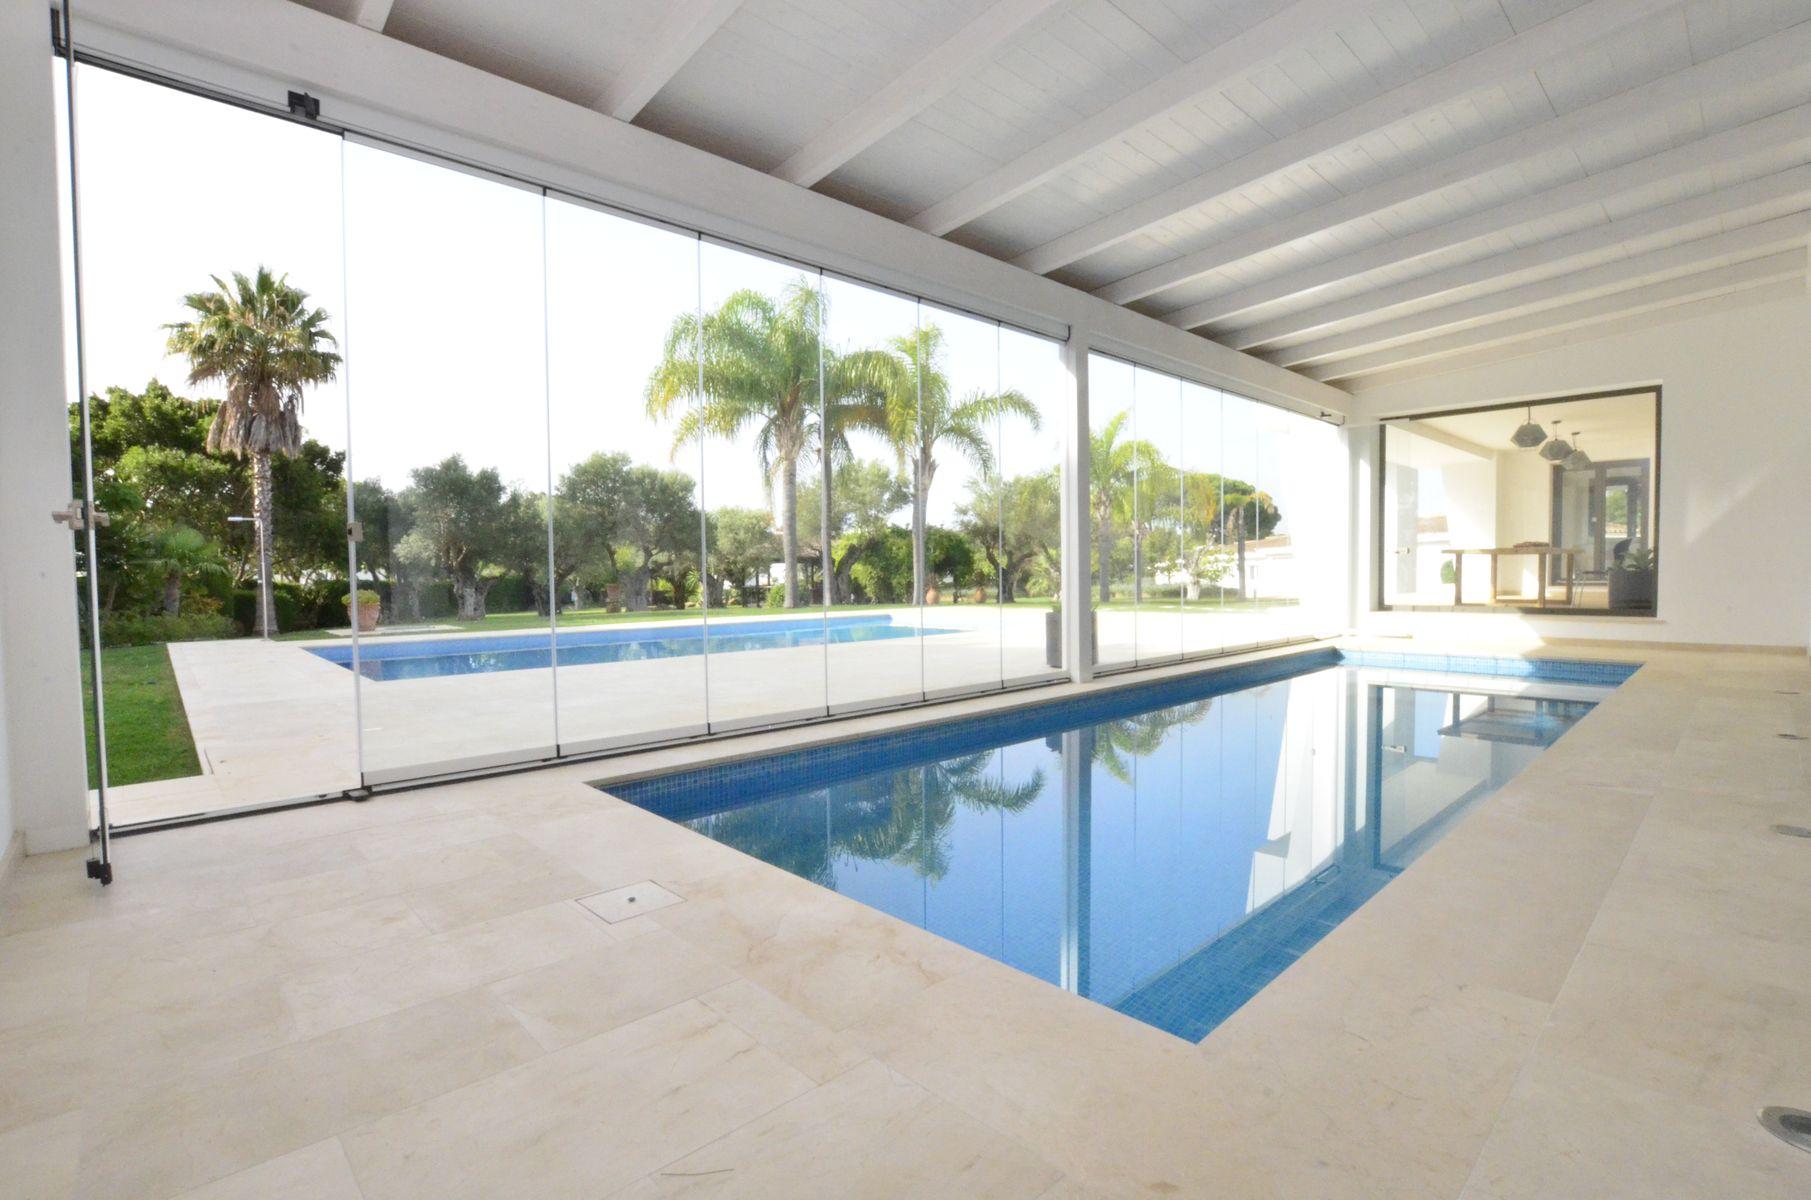 8 Bedroom Villa for Sale in Sotogrande Costa